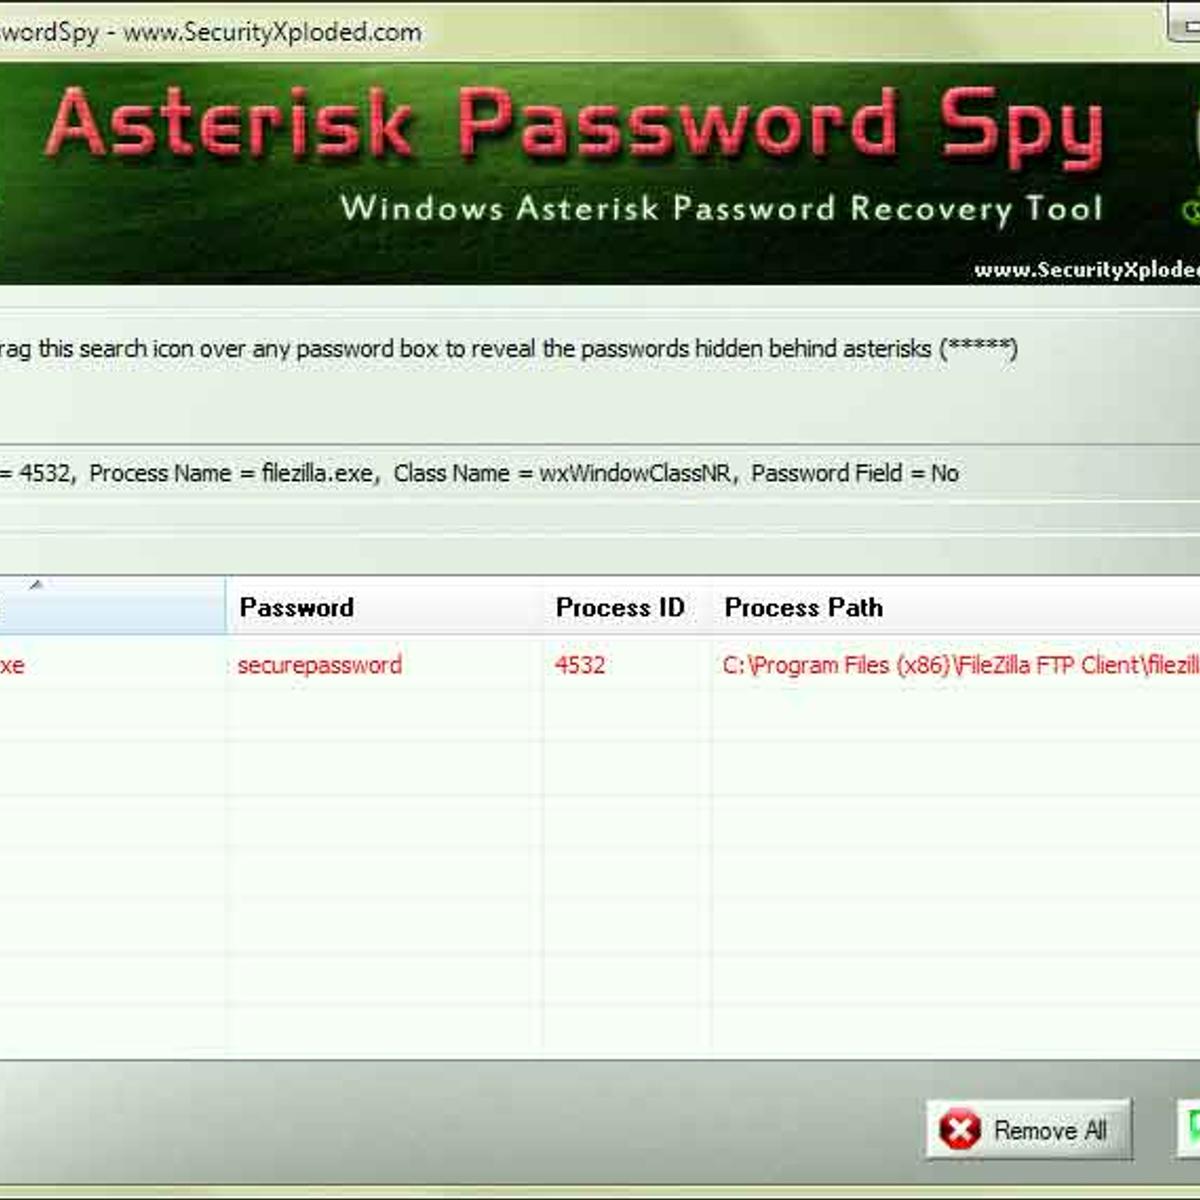 Asterisk Password Spy Alternatives and Similar Software